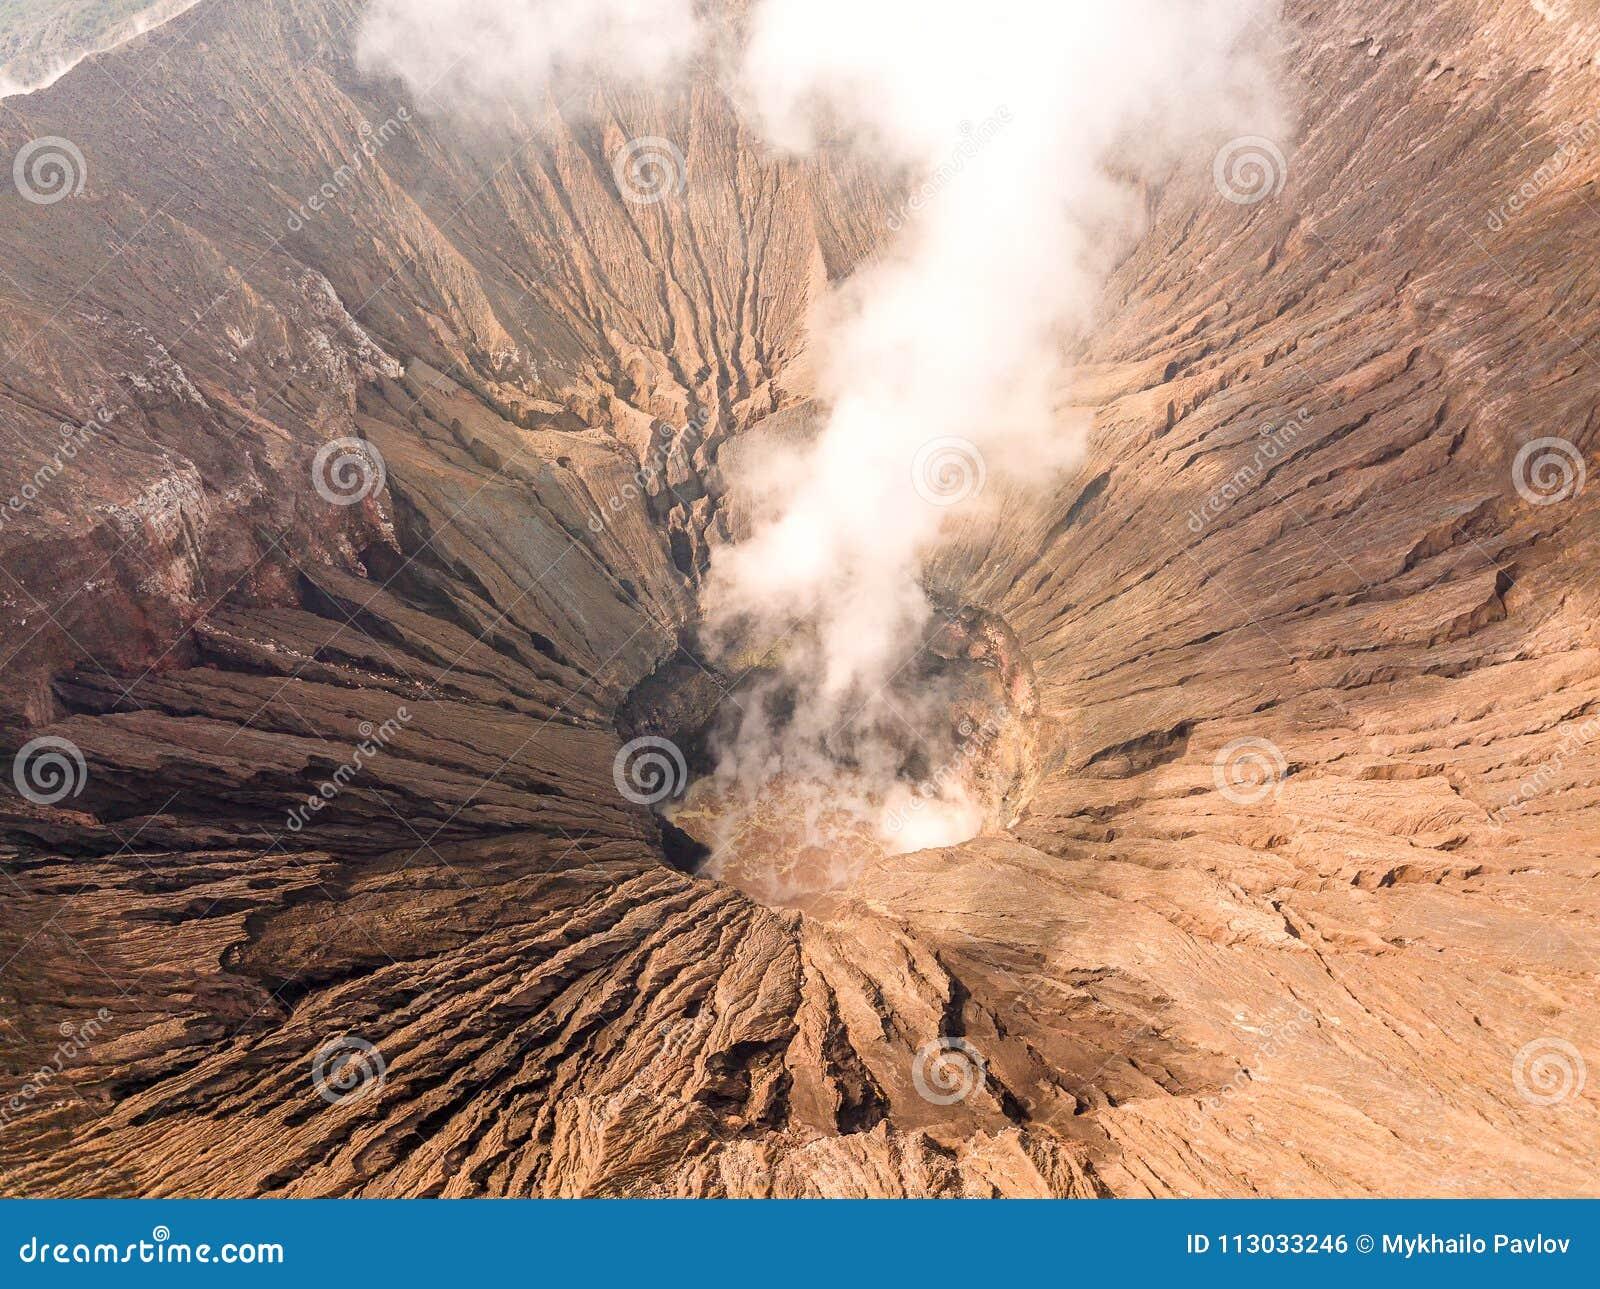 Cráter de un volcán activo Silueta del hombre de negocios Cowering